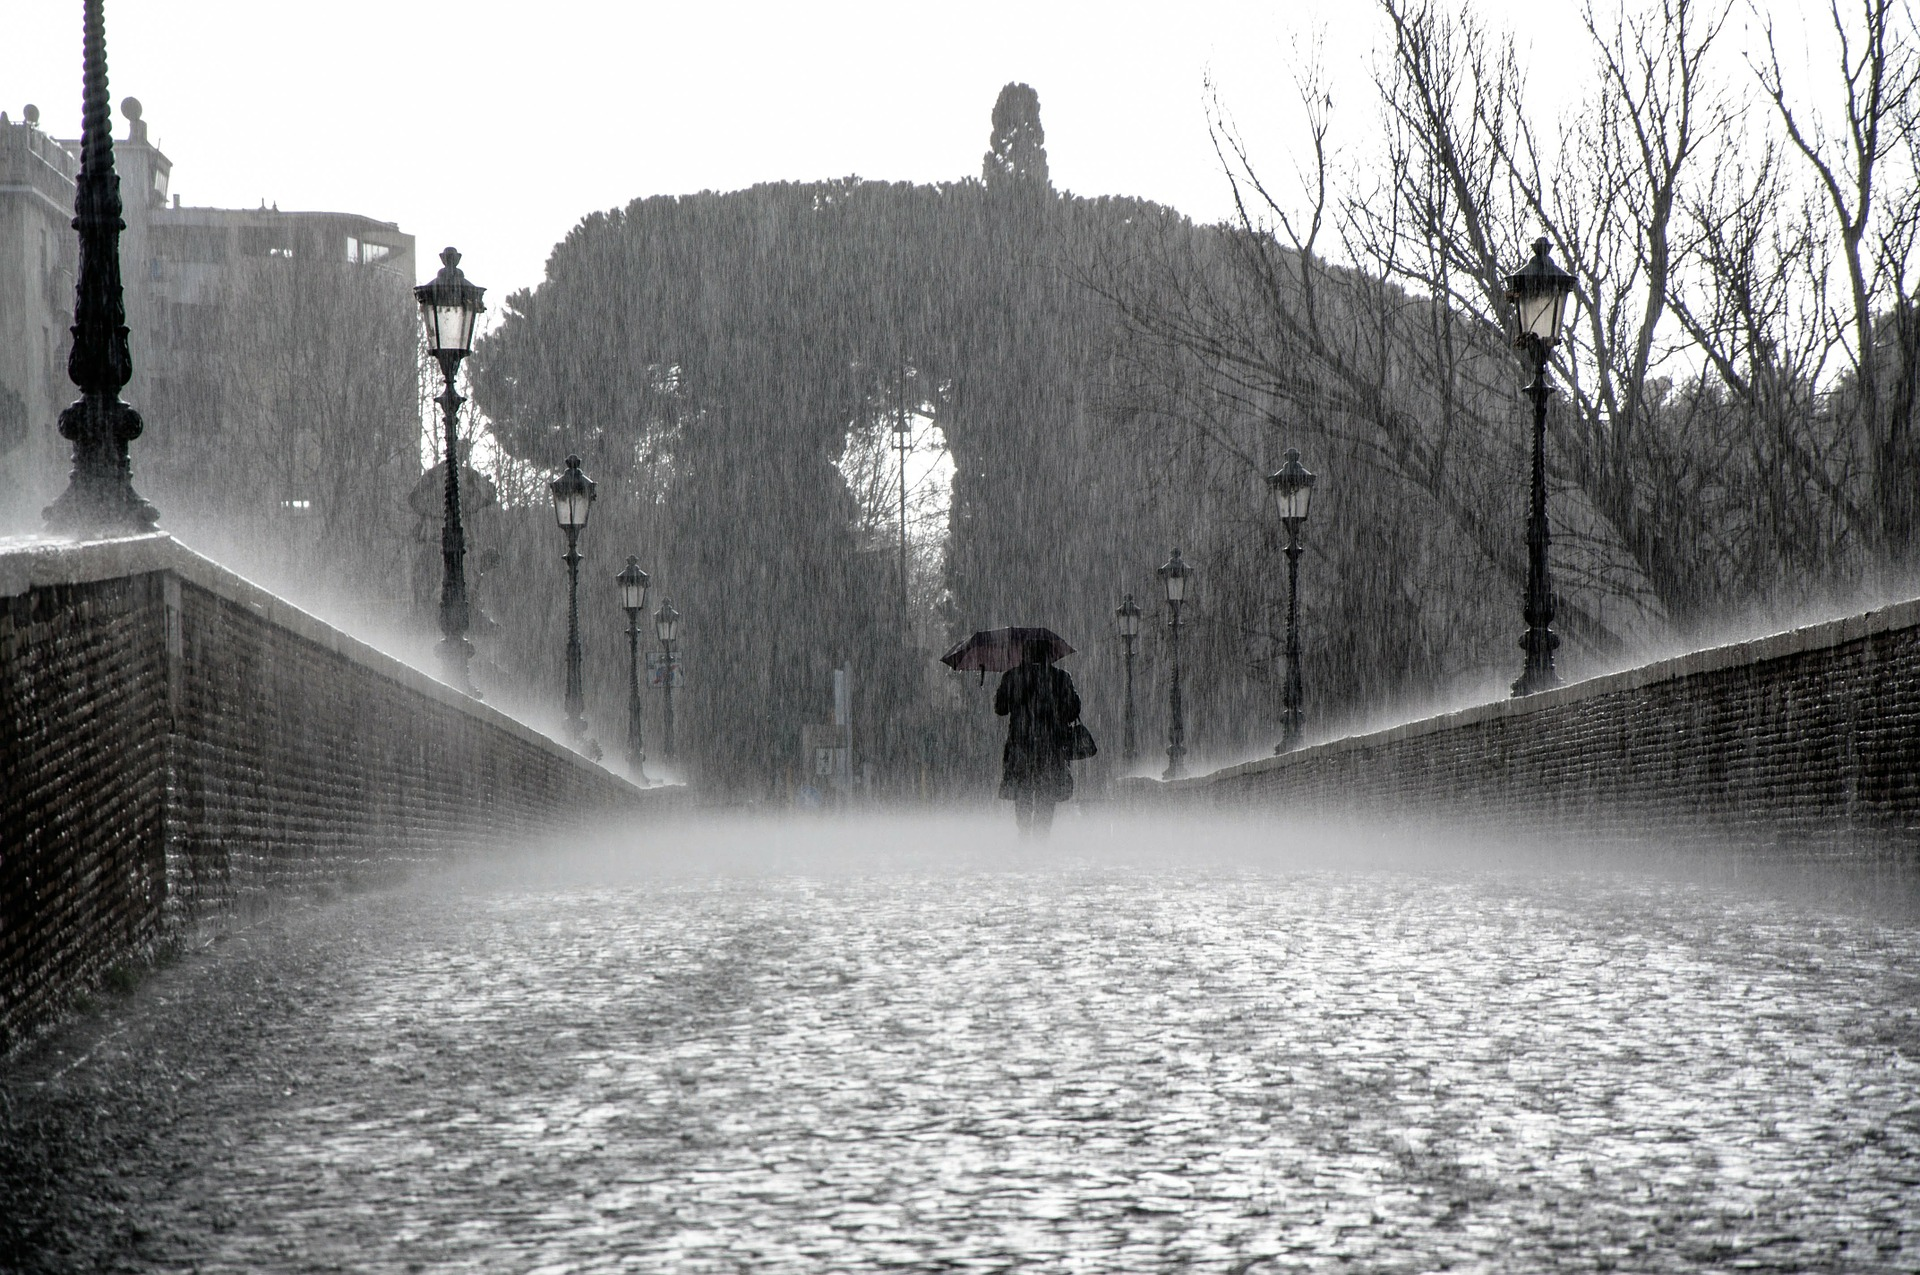 https://formasloff.ru/wp-content/uploads/2019/10/rain-275317_1920.jpg